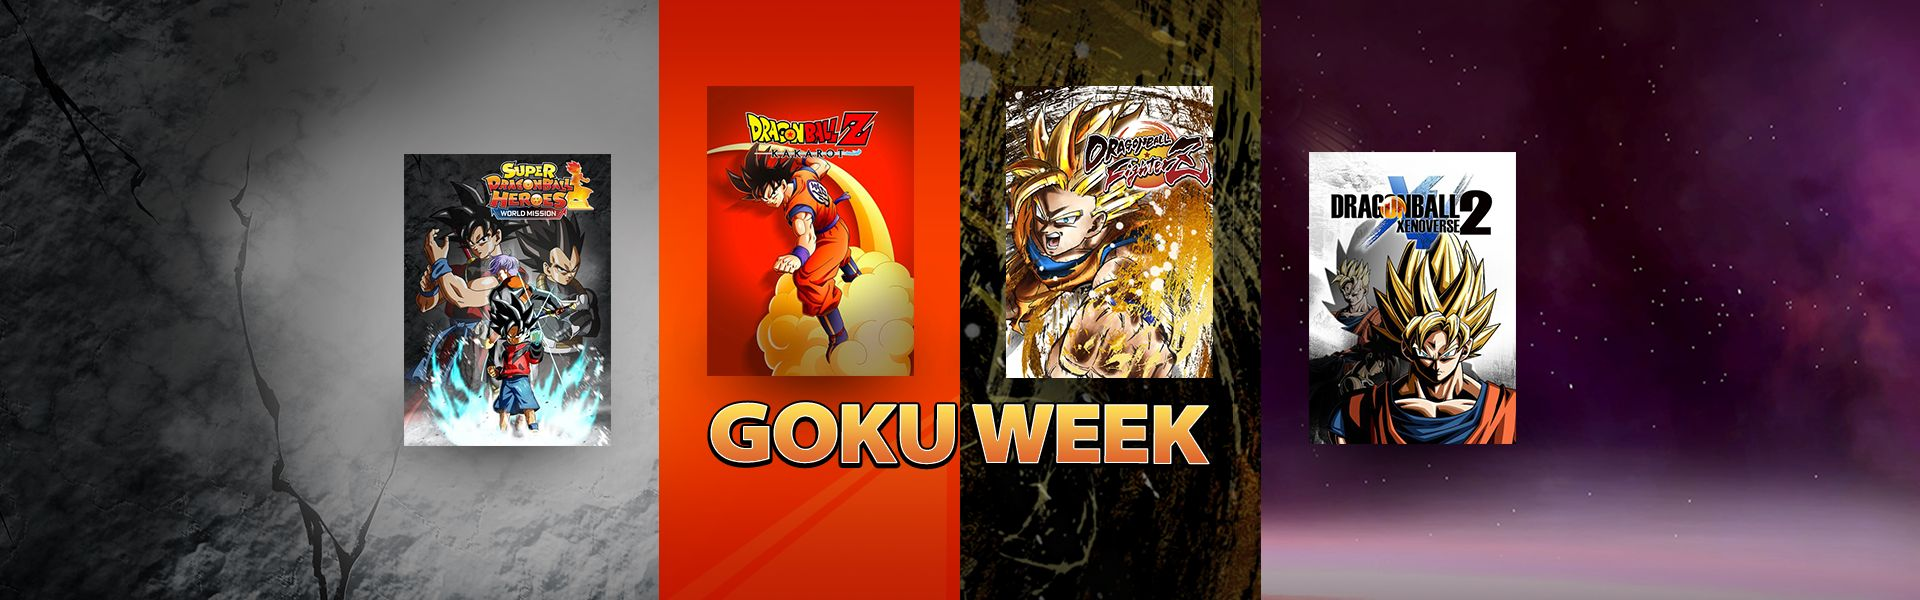 GOKU WEEK: Up to -85% off